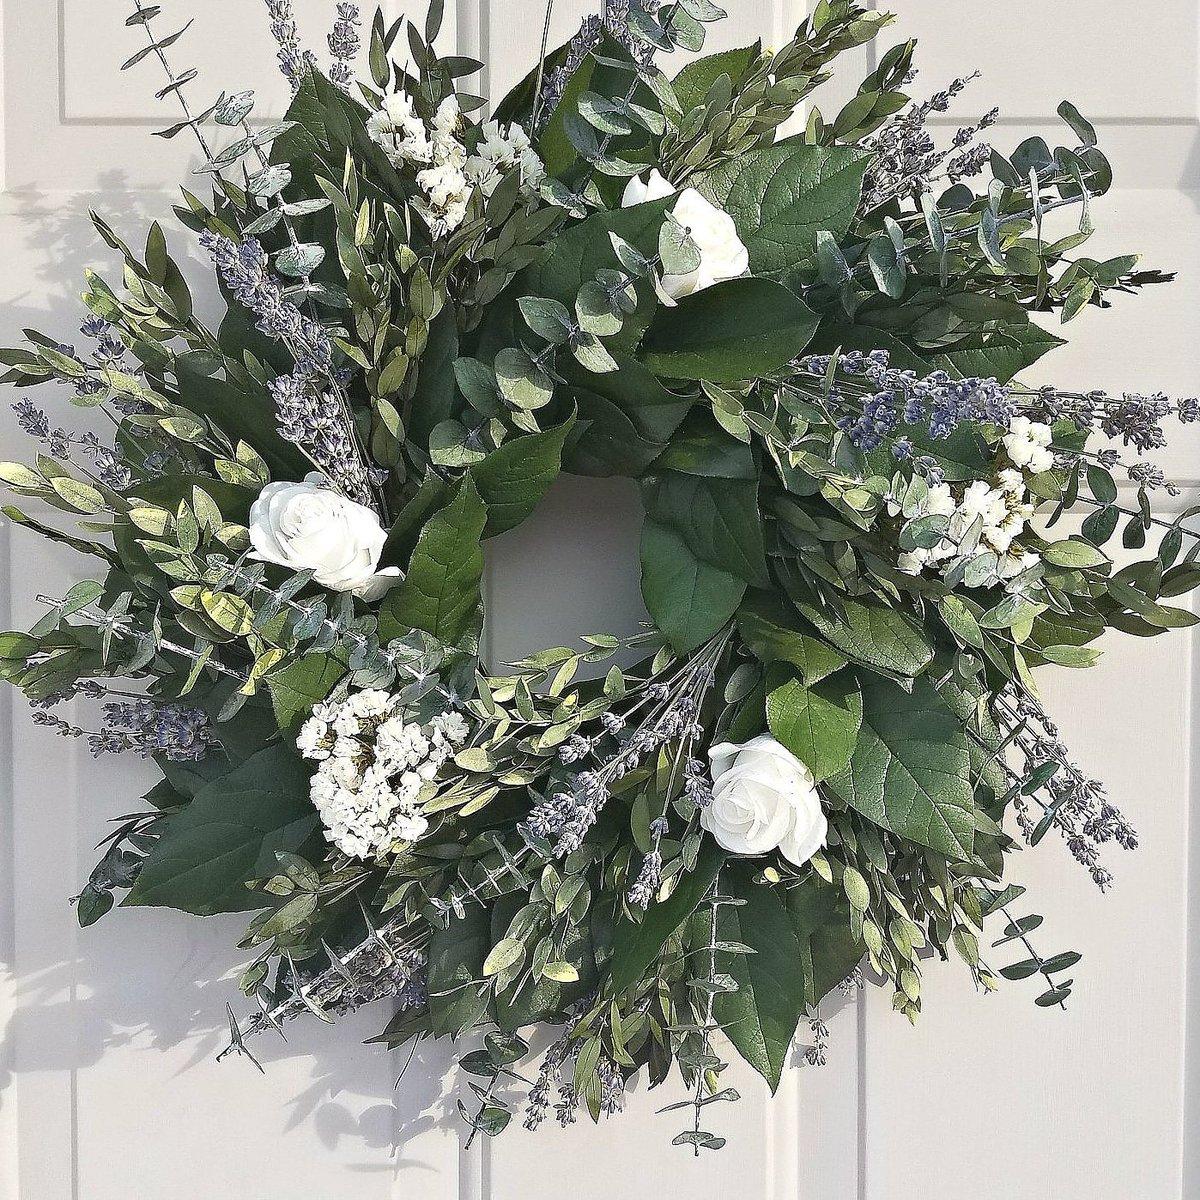 Handmade preserved wreaths  http:// endlessblossoms.com  &nbsp;   #preservedroses #preservedwreaths #etsyseller #wreaths<br>http://pic.twitter.com/p5qro9lM7z